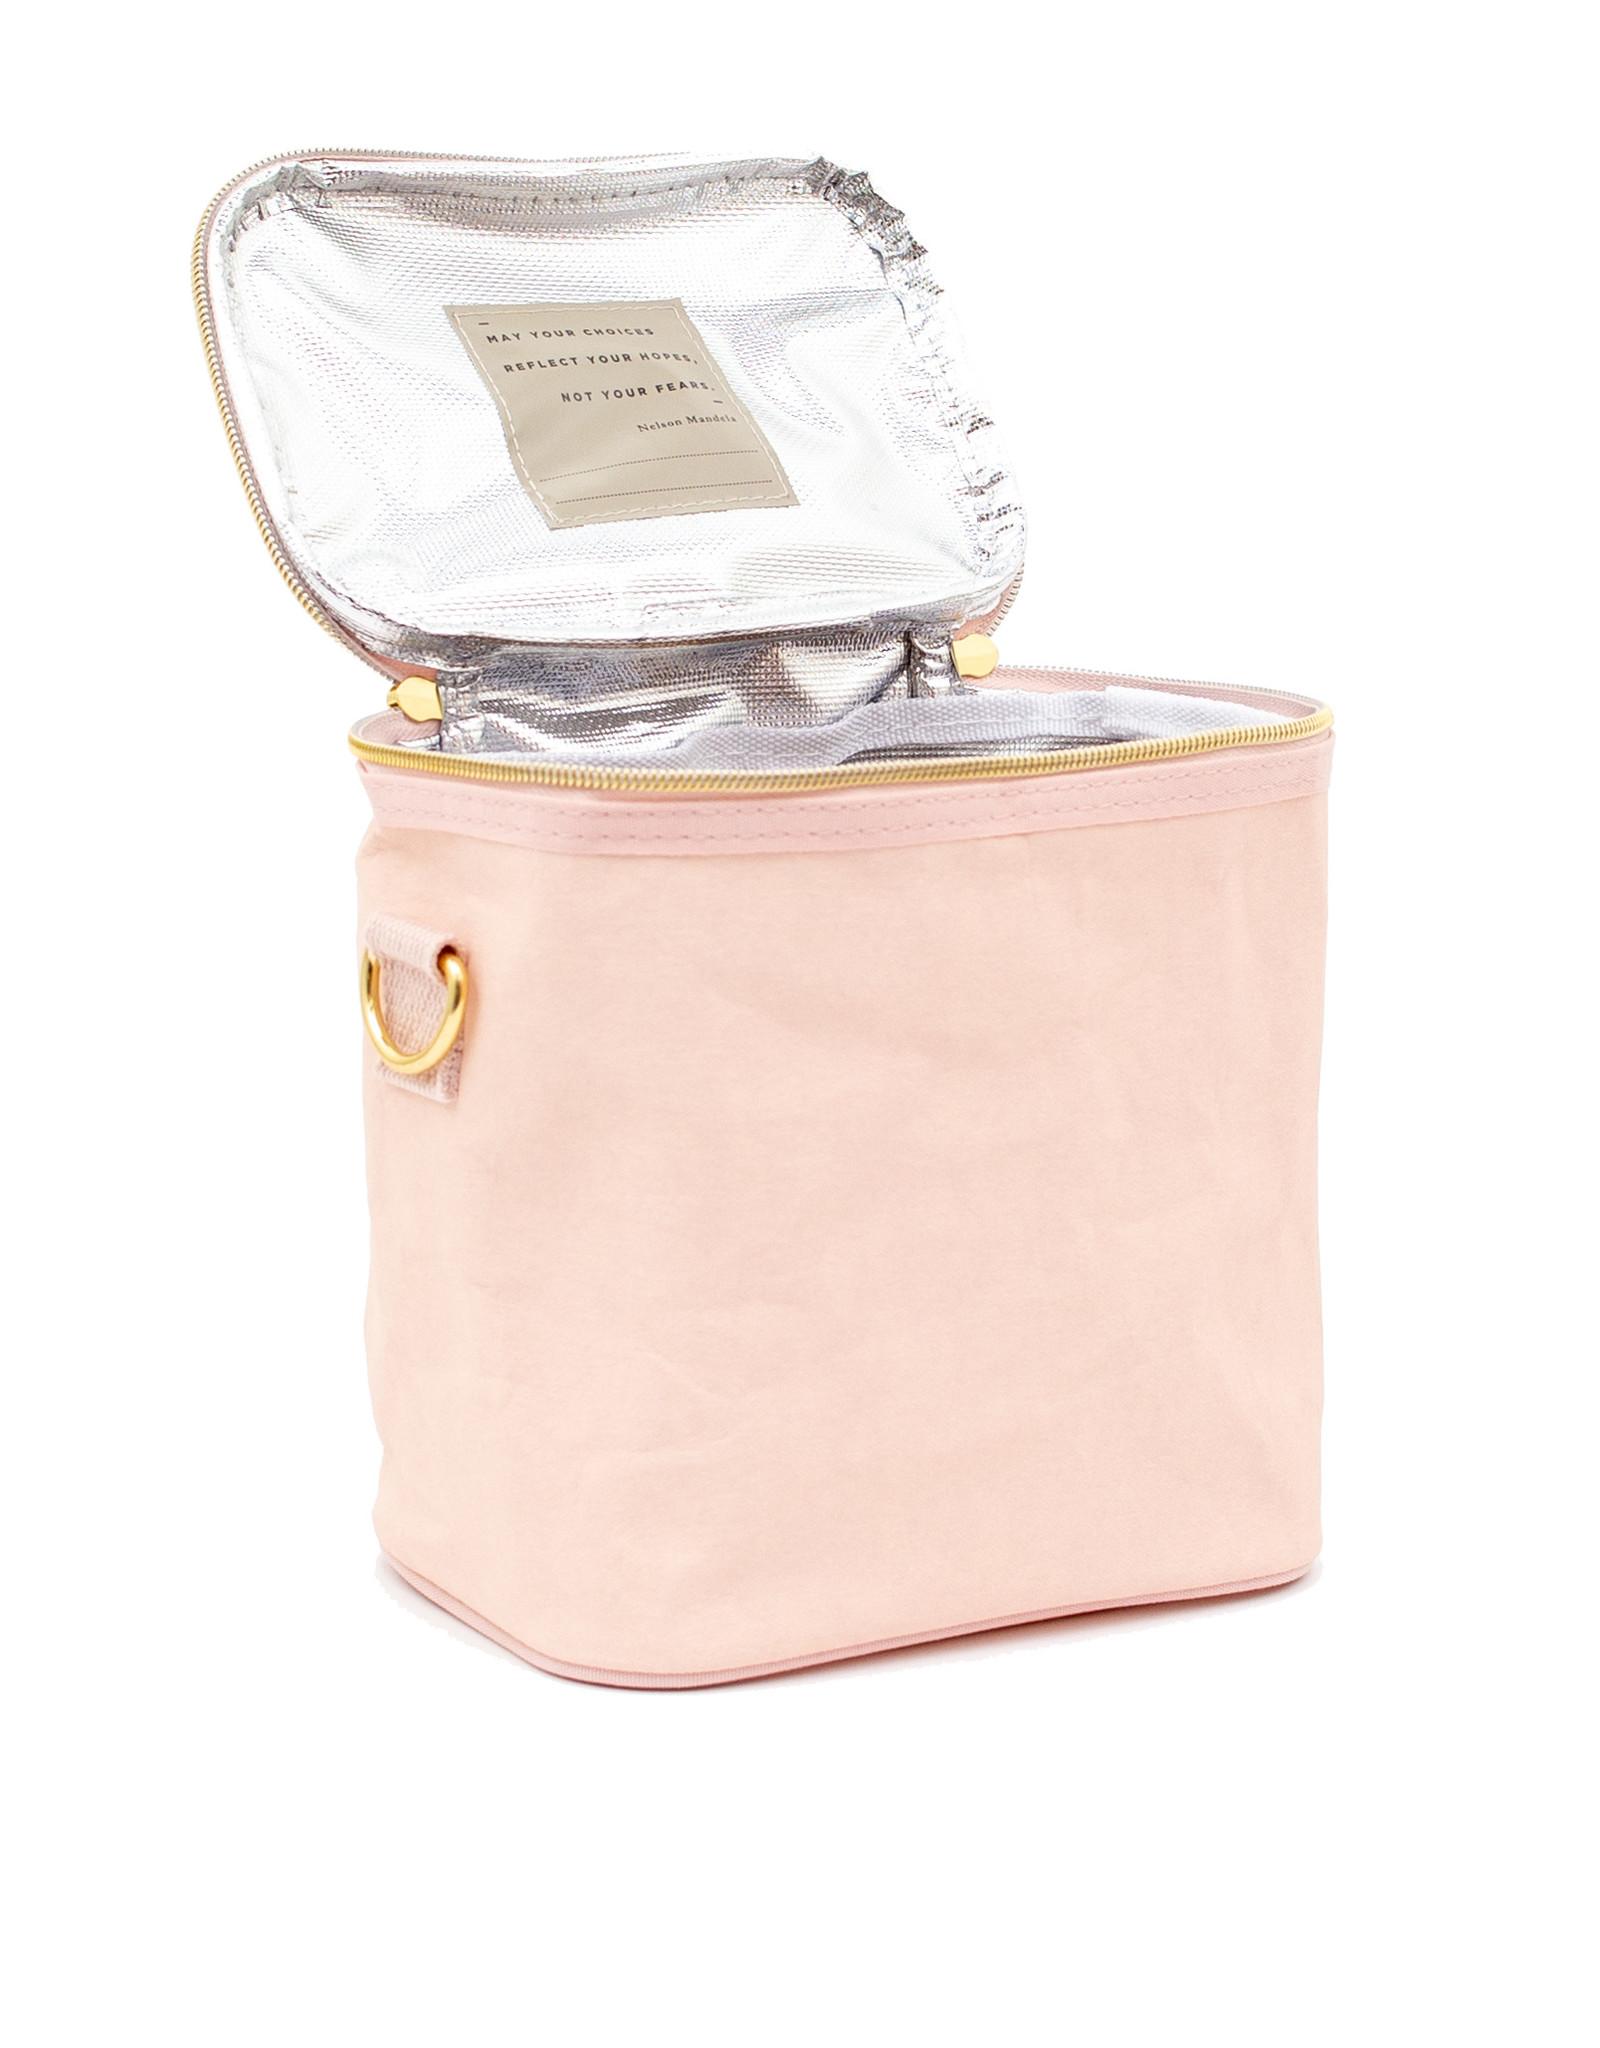 Blush Pink Paper Petite Poche